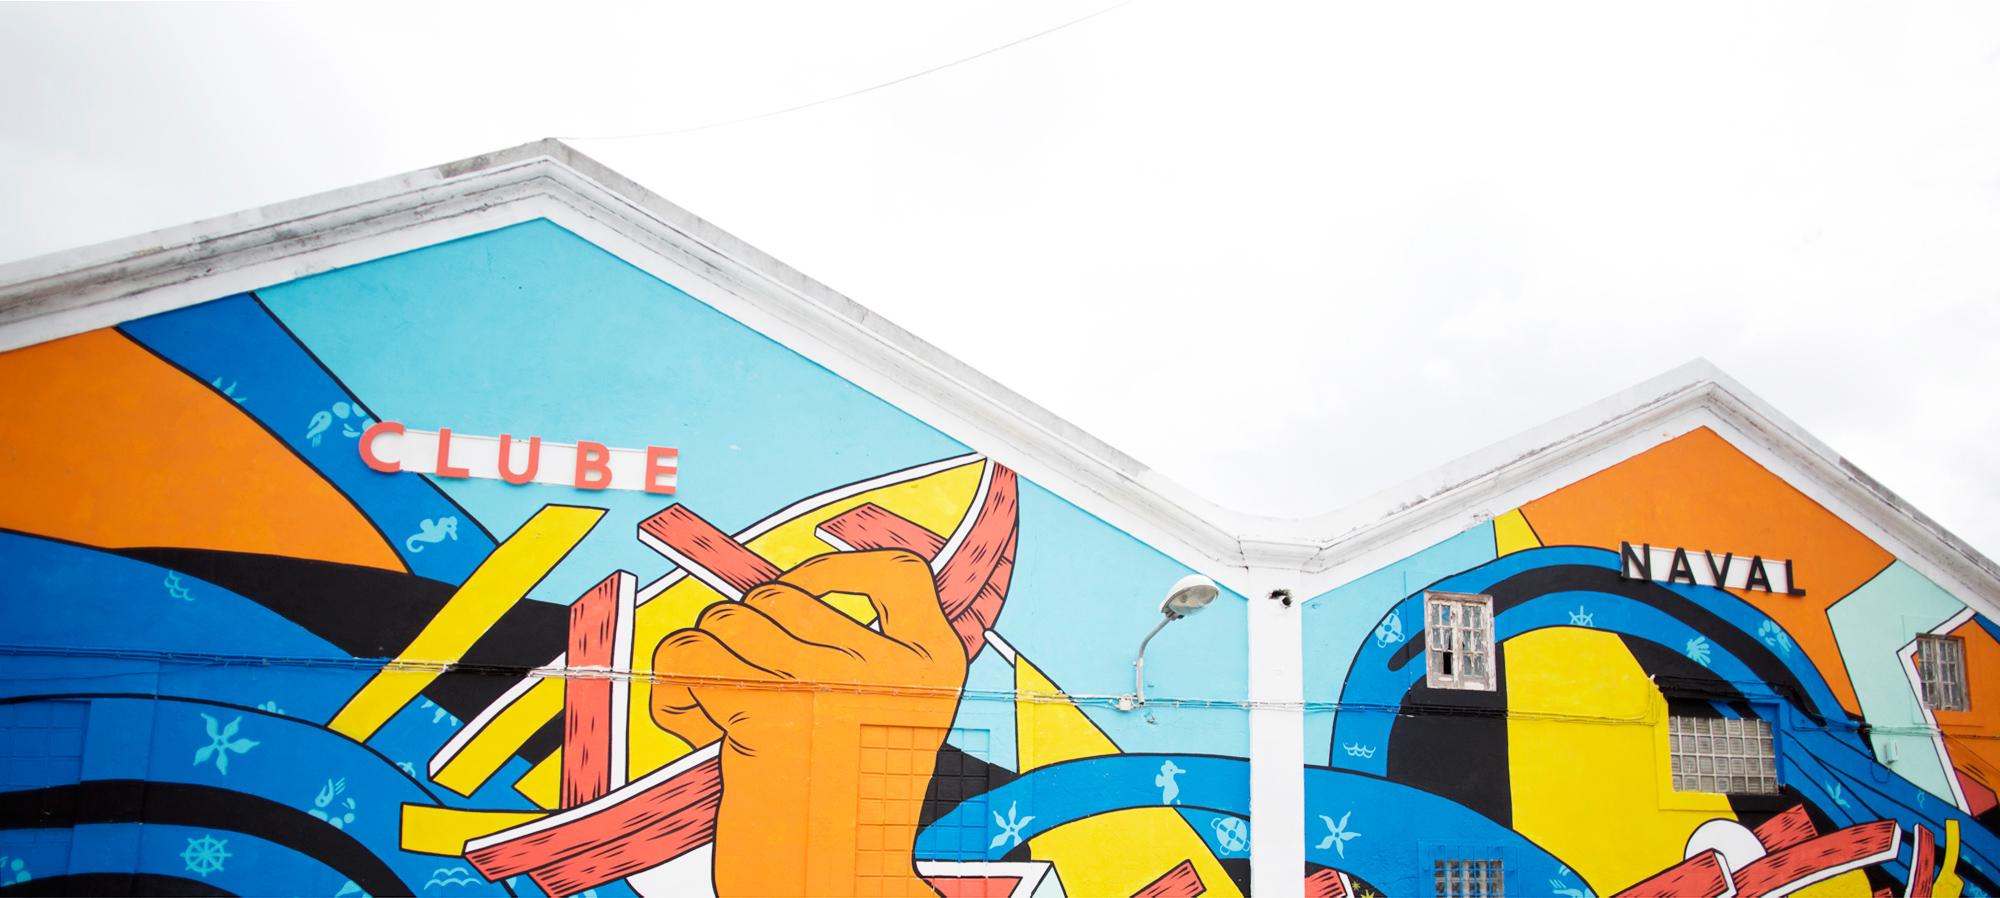 clubenavalcaissodre_streetart_03